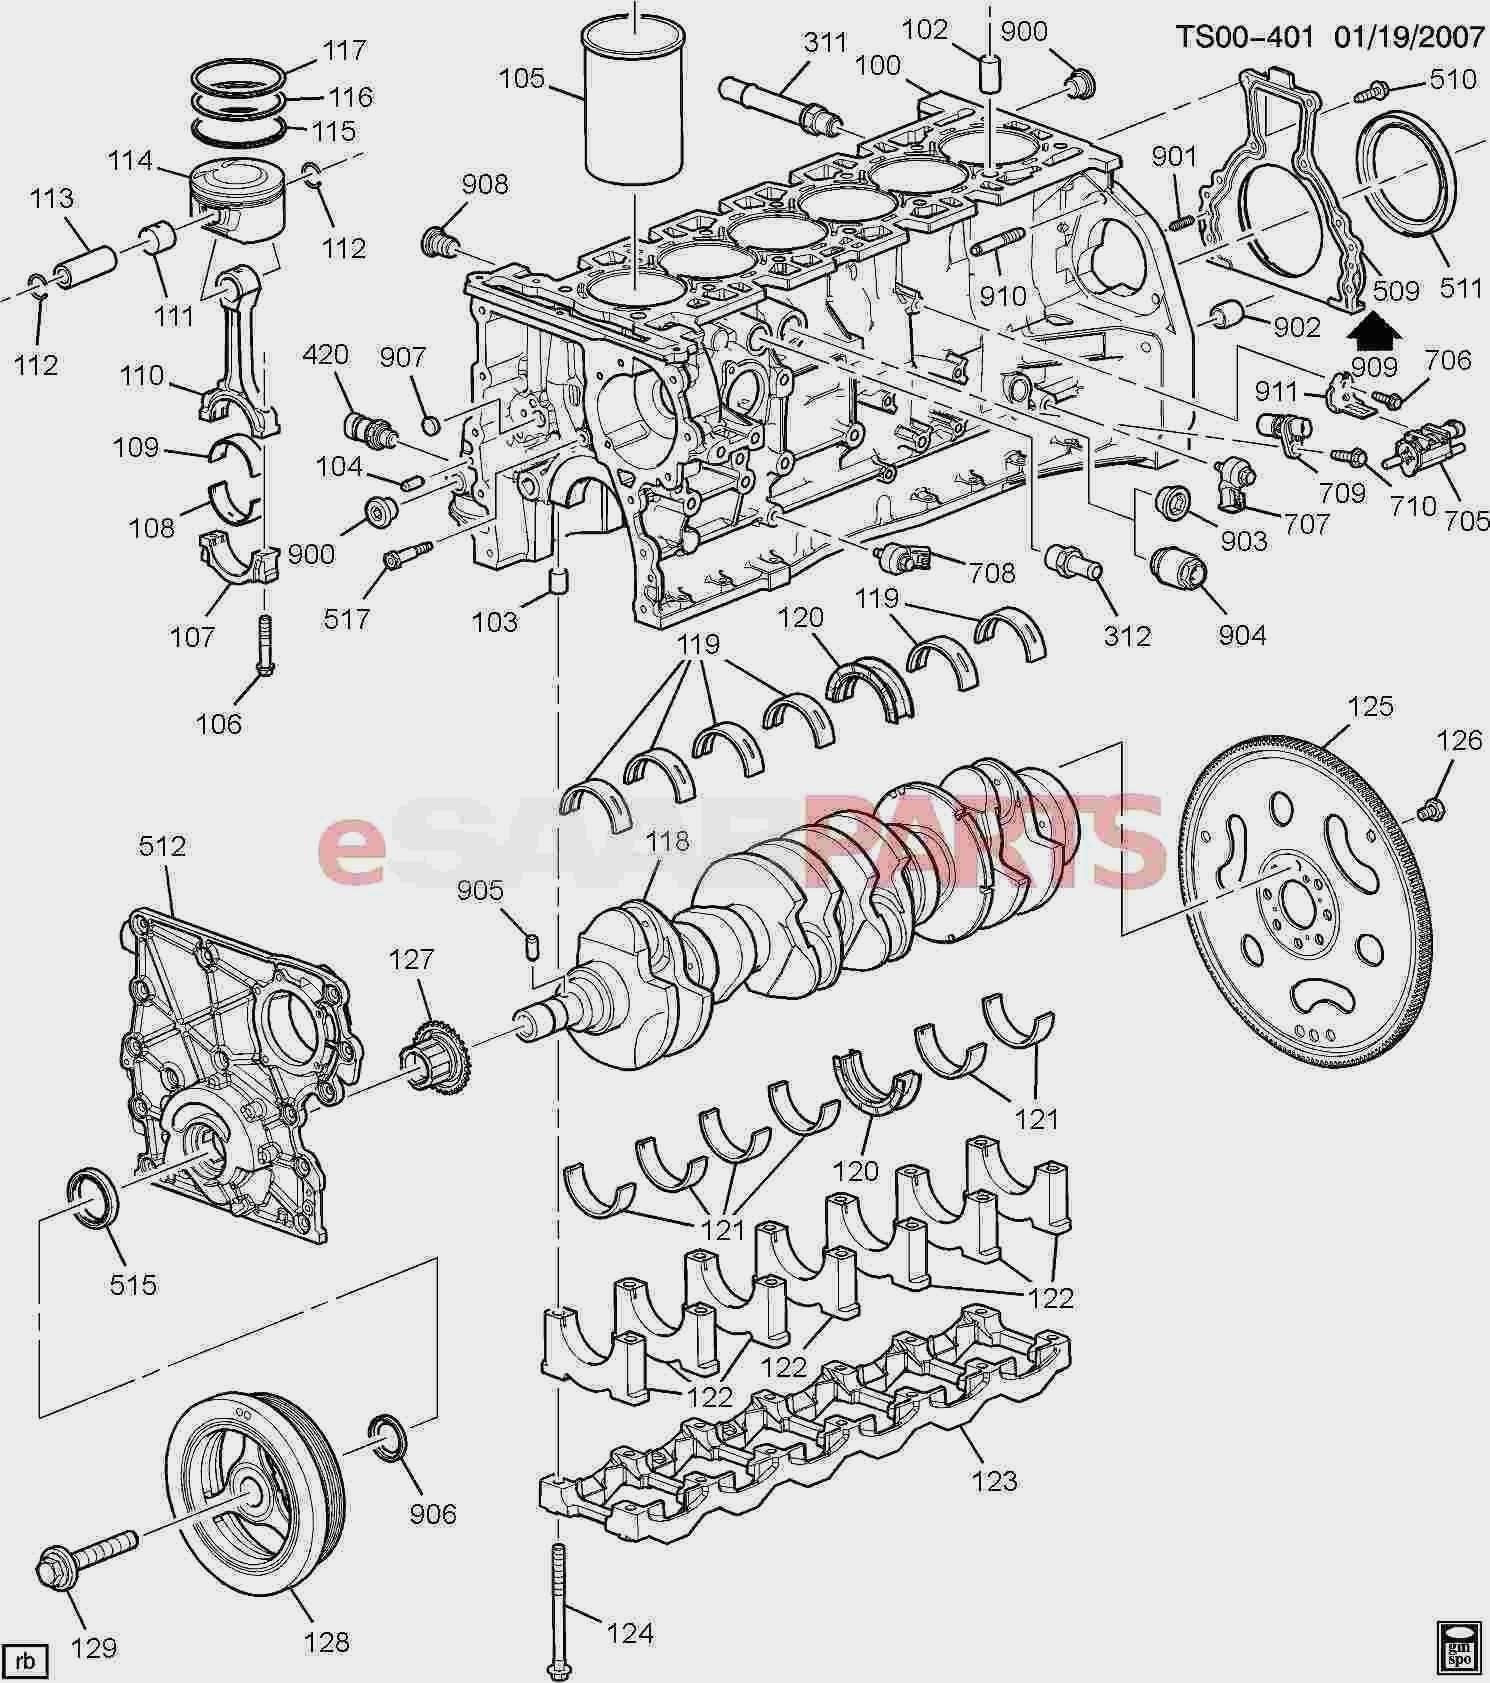 Automobile Engine Diagram Saab Usa Parts Of Automobile Engine Diagram